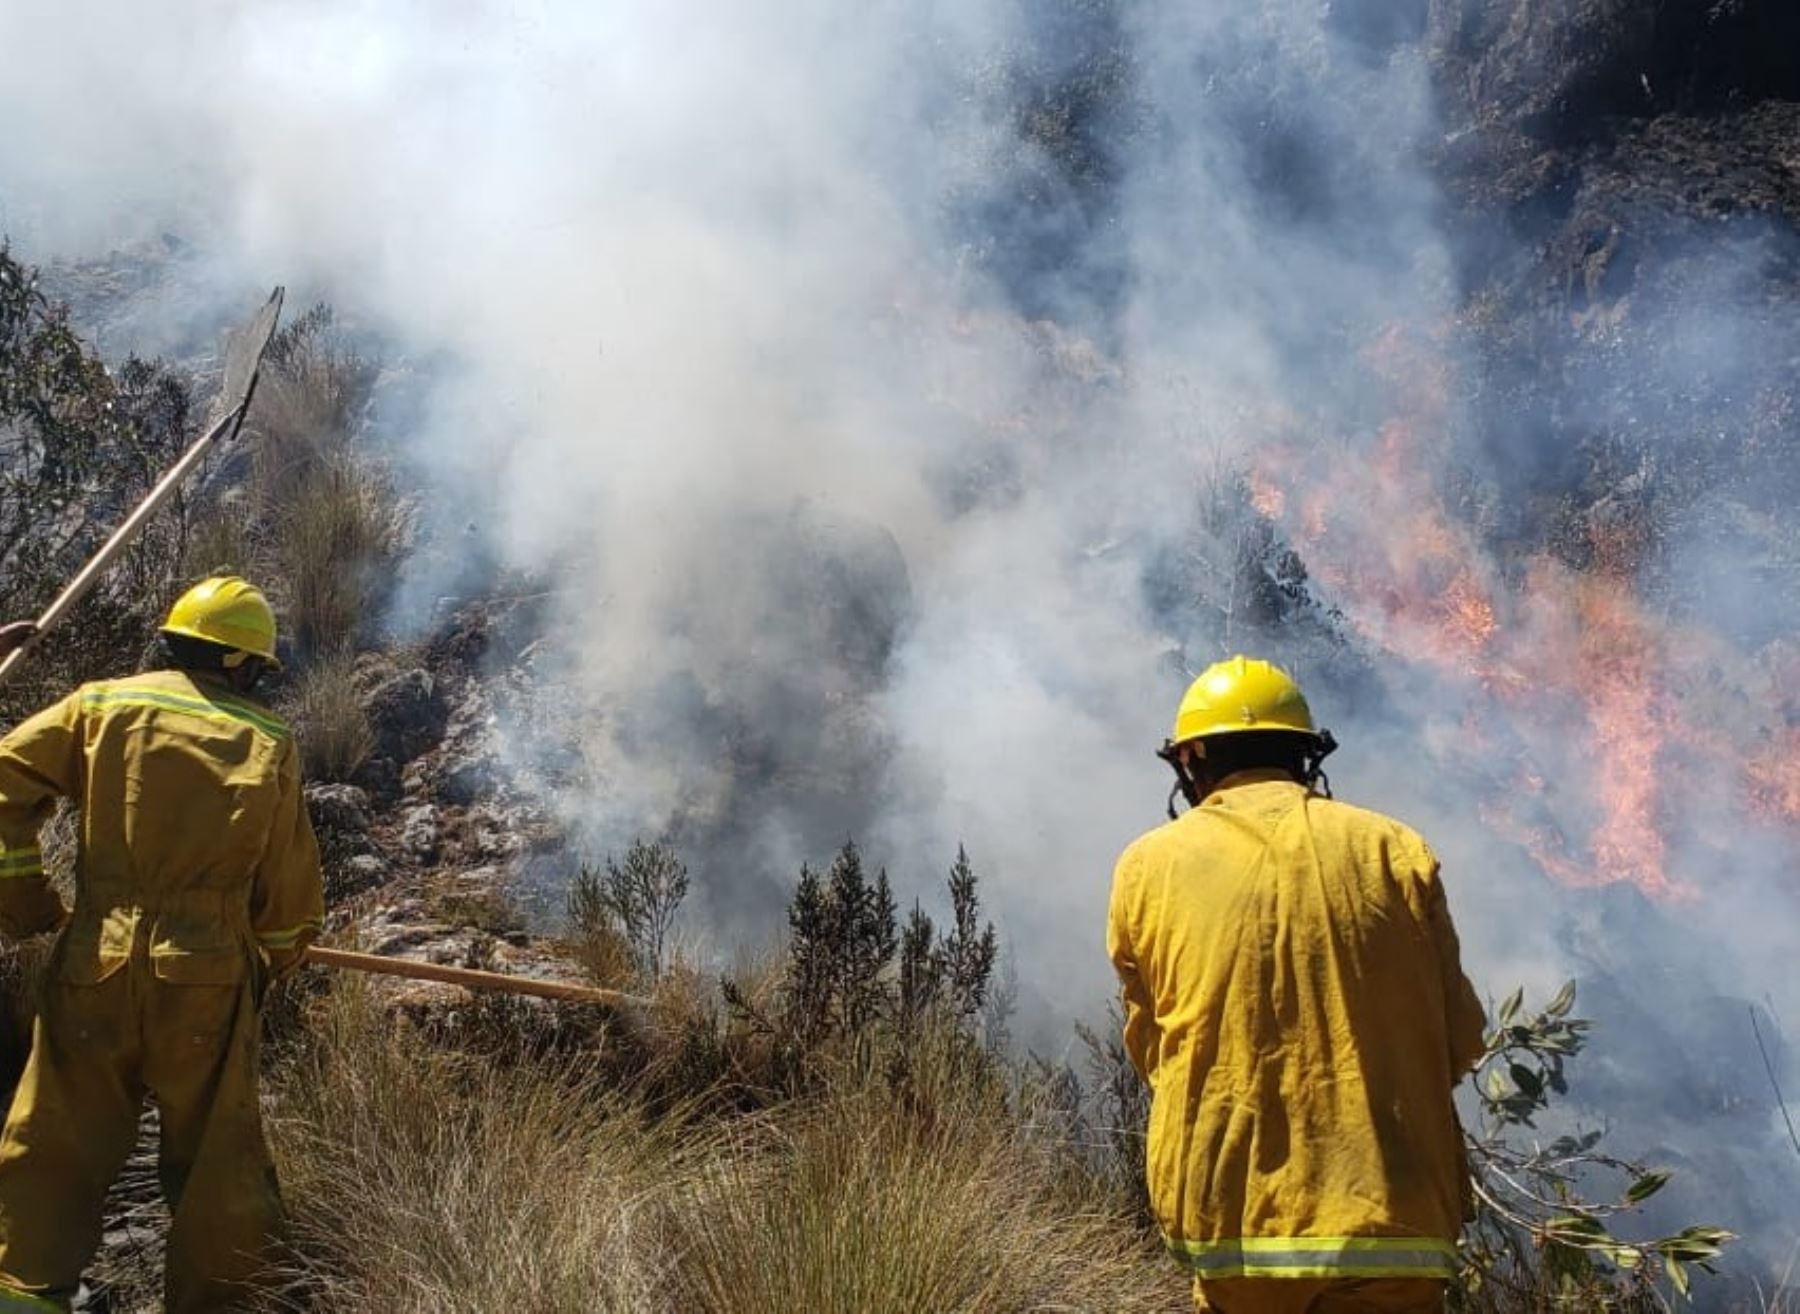 Guardaparques bomberos redoblan esfuerzos para extinguir incendios forestales en áreas cercanas al Parque Nacional Huascarán. ANDINA/Difusión